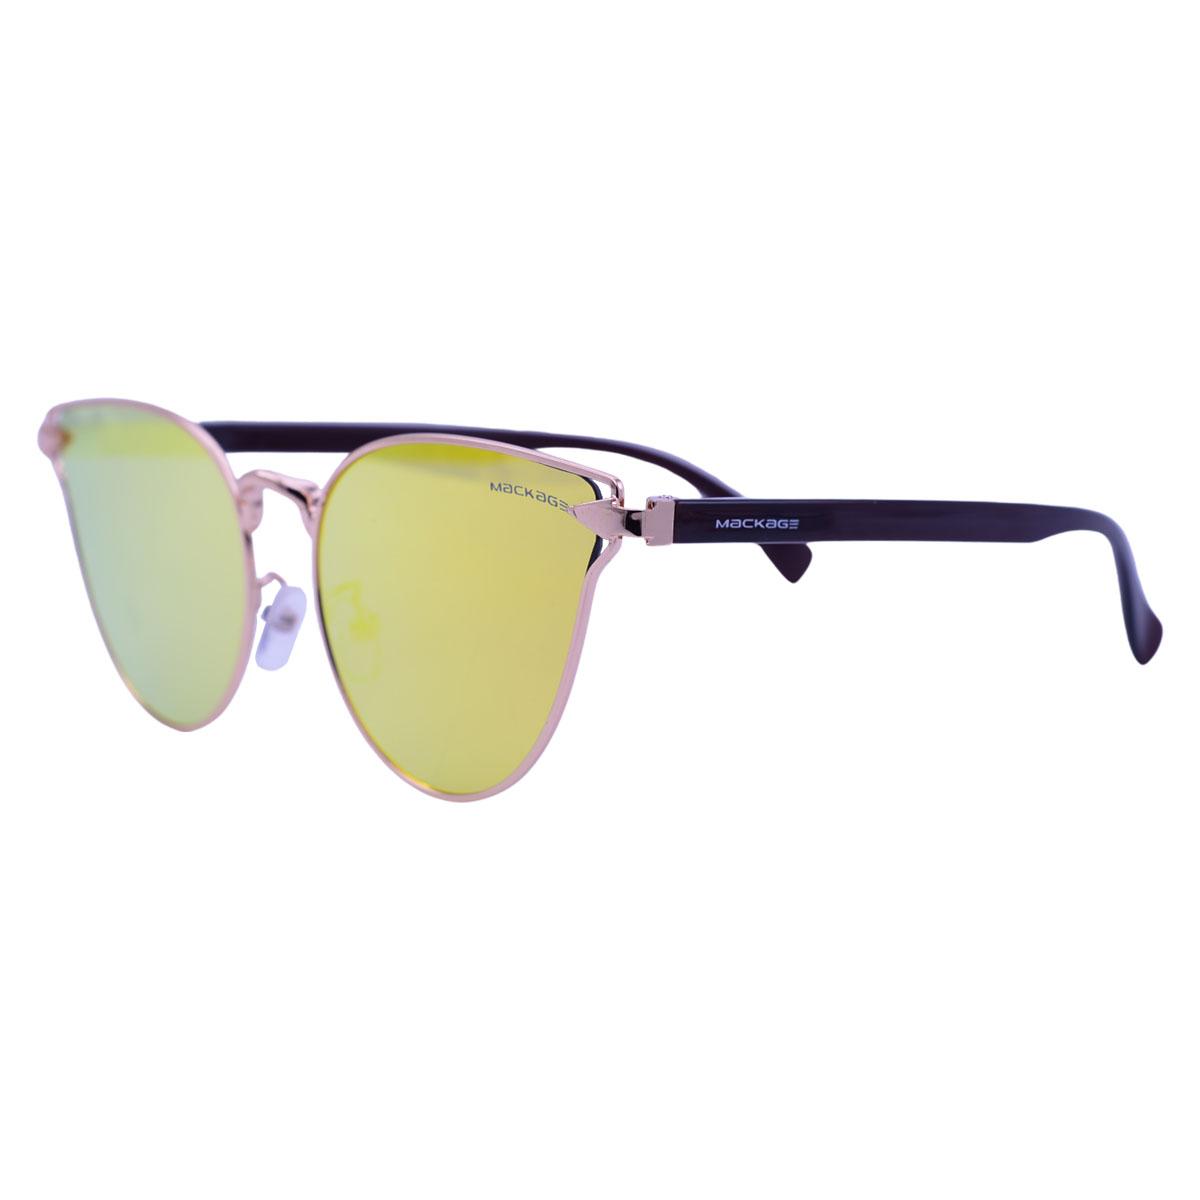 Óculos de Sol Mackage Metal/Acetato Feminino Gateado - Dourado